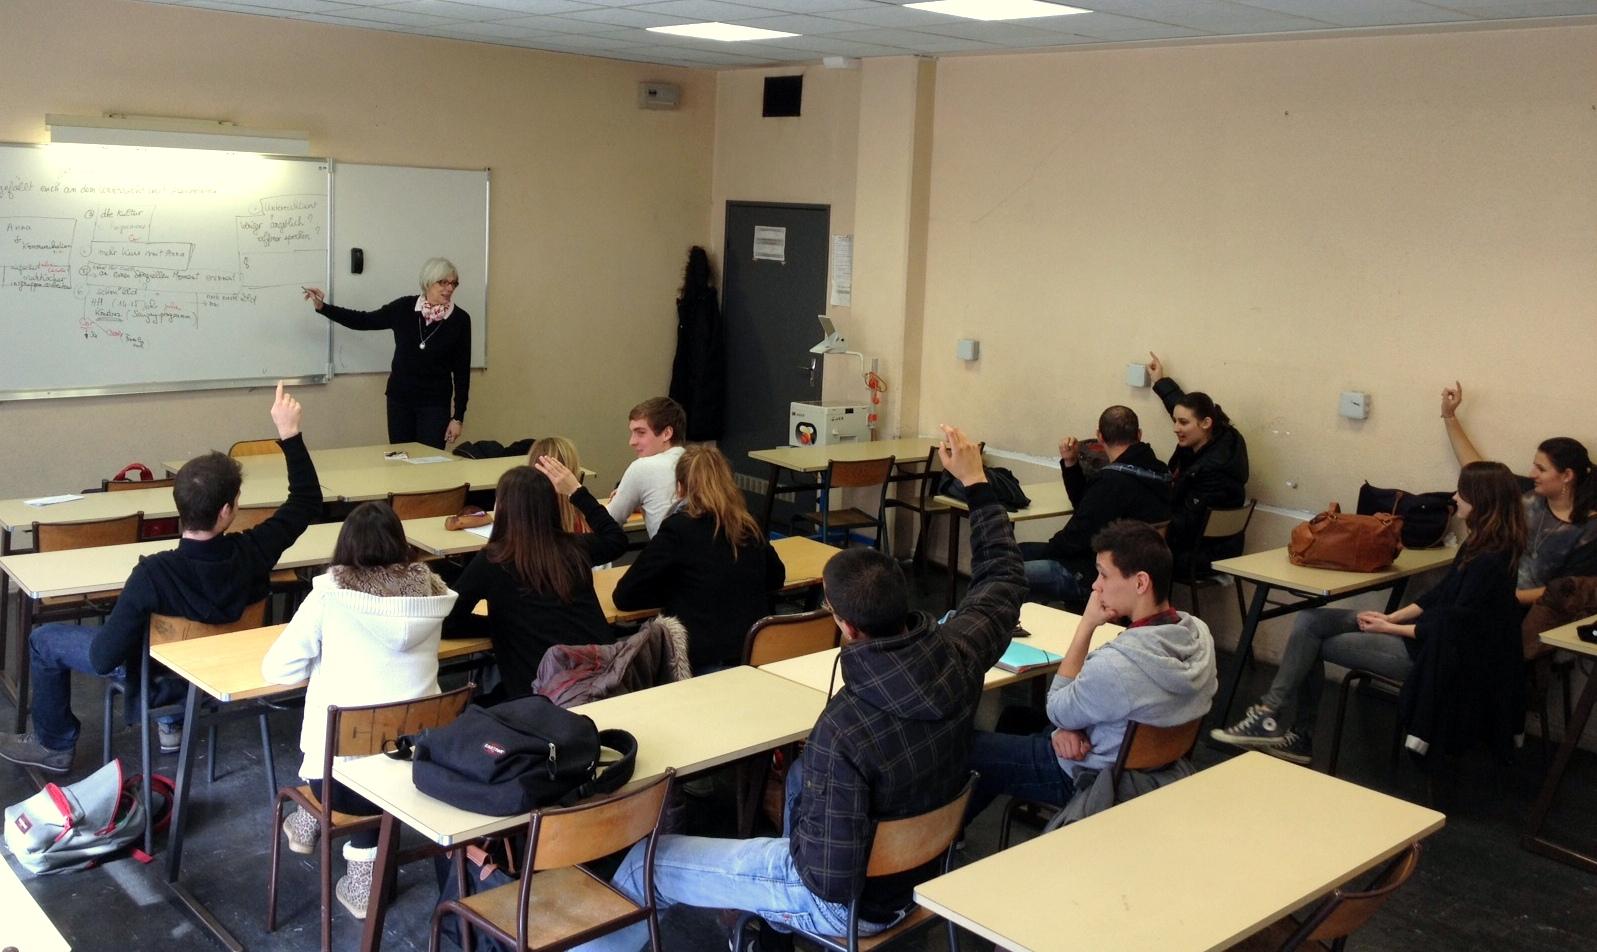 Annemarie Richard is teaching the graduating class in German